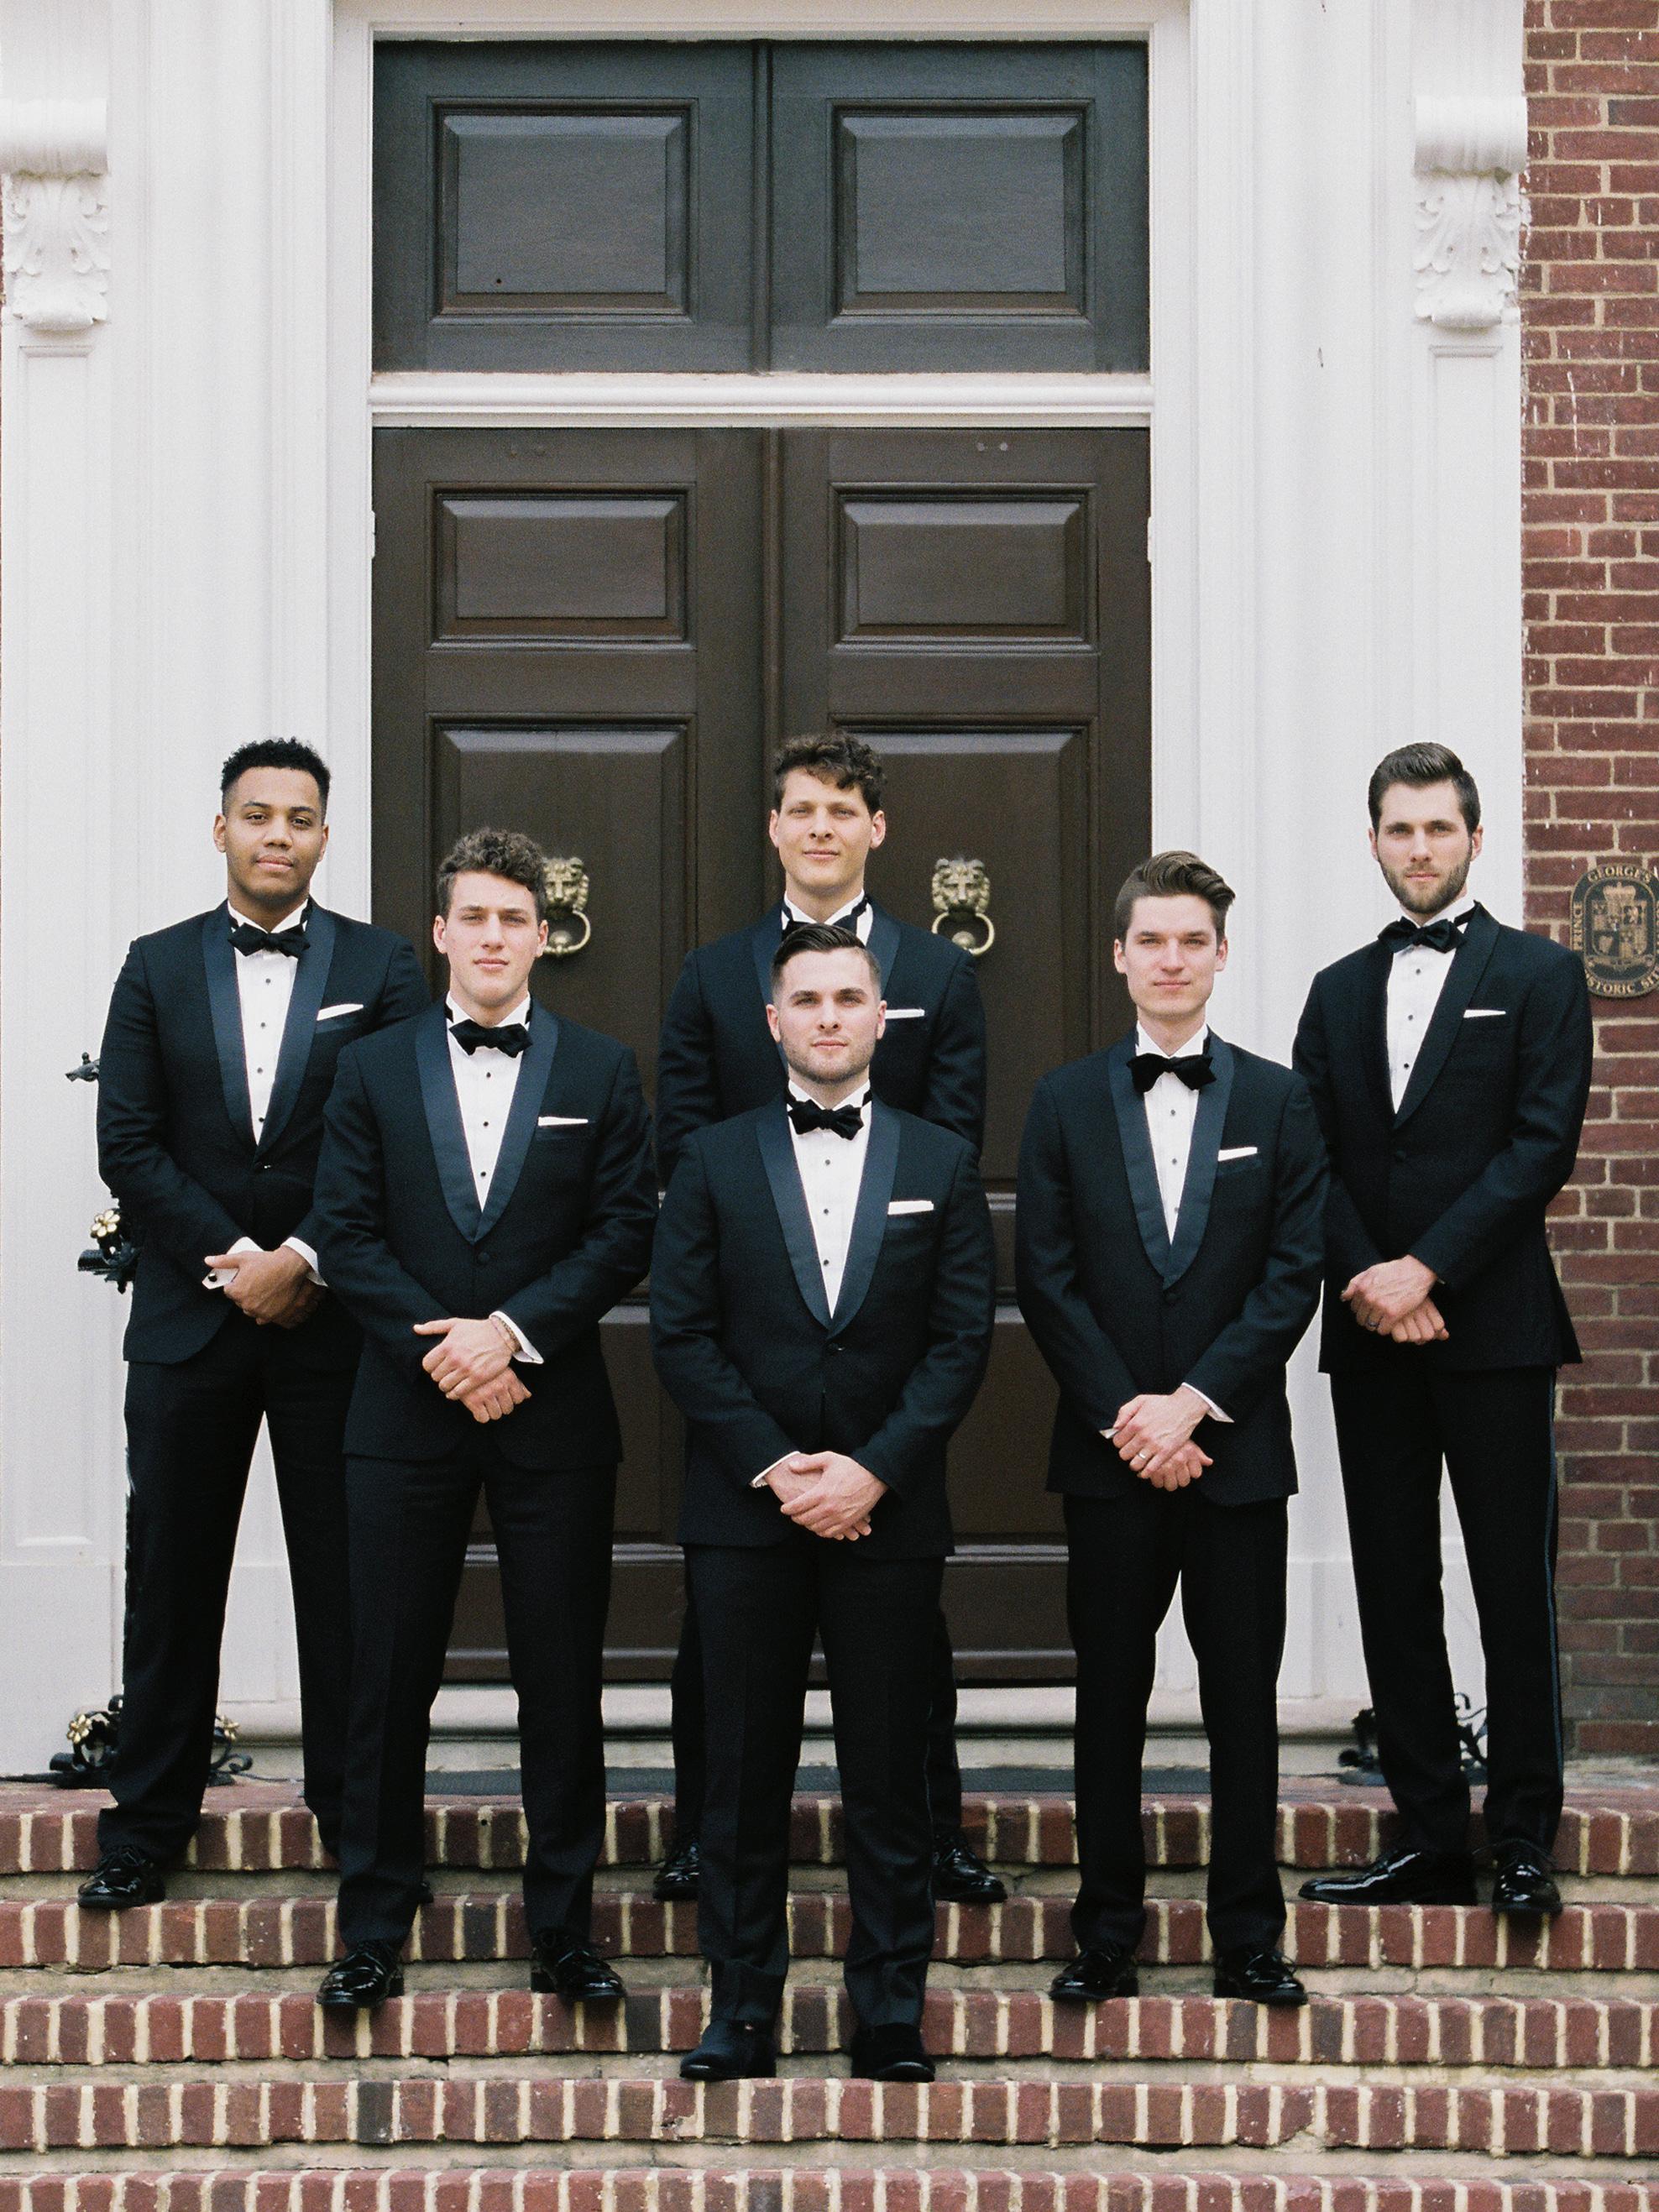 macey joshua wedding groom and groomsmen in black tuxedos